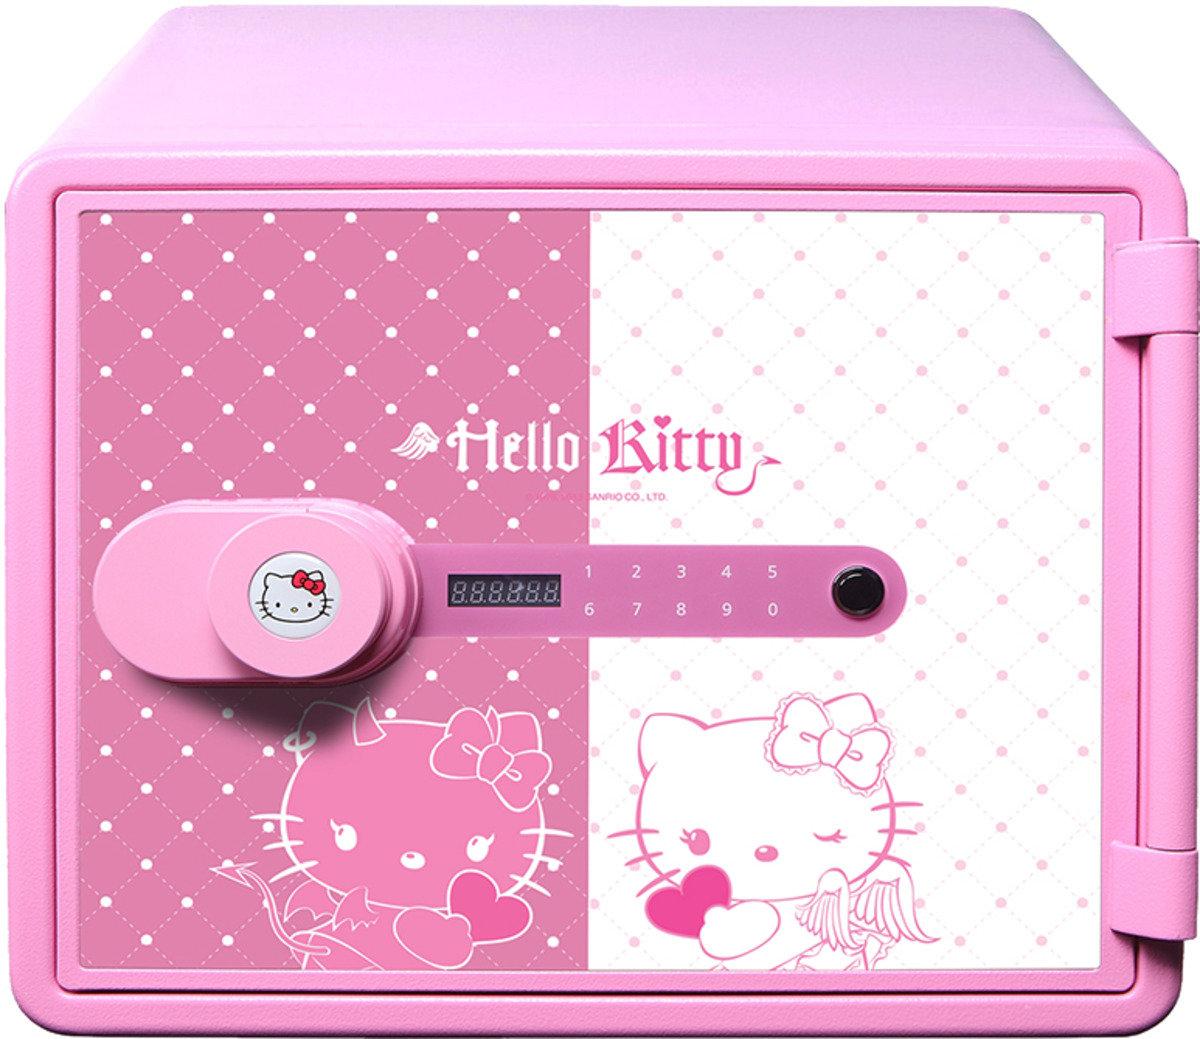 KT-M020WP Hello Kitty 防火金庫夾萬電子密碼鎖 (粉紅色)